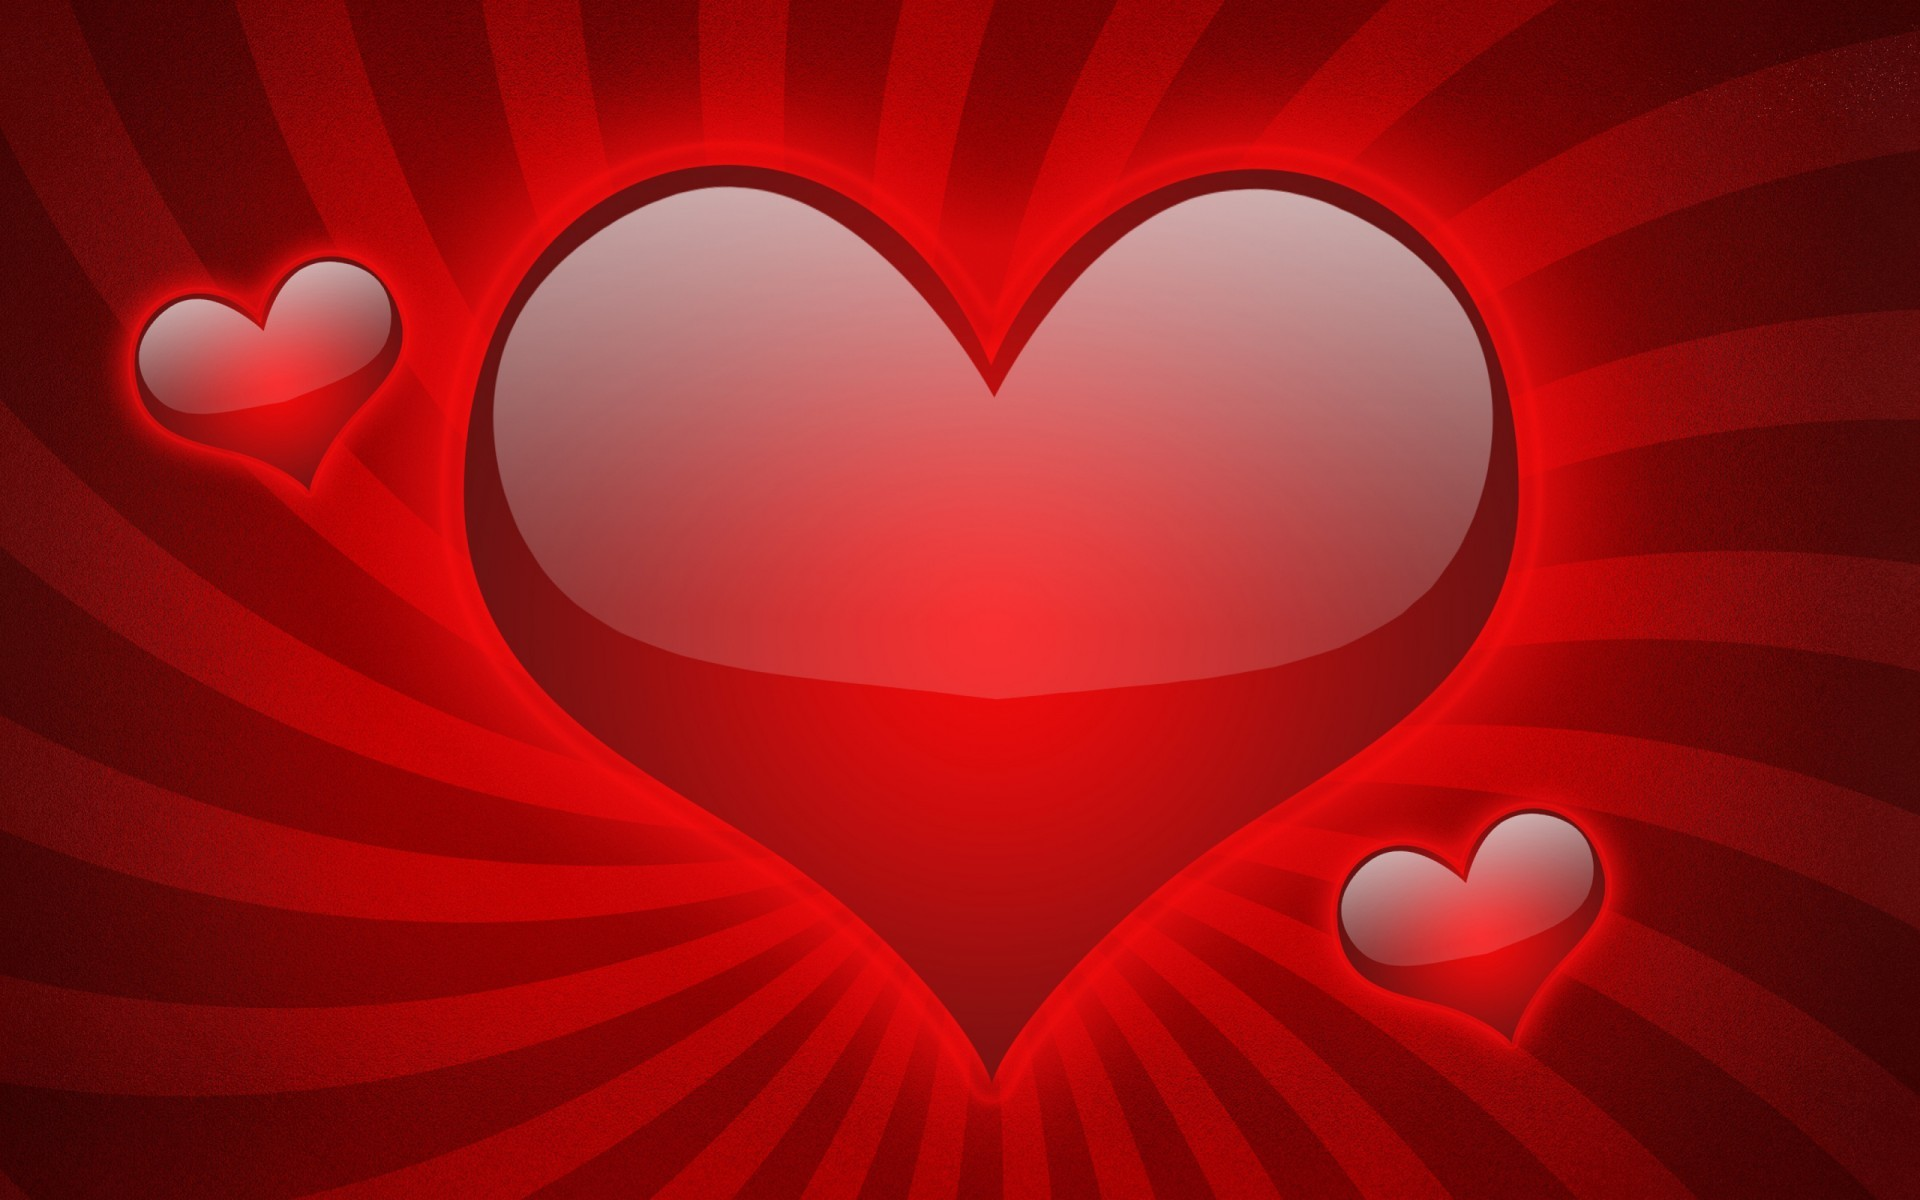 816653 widescreen hearts background wallpaper 1920x1200 4k